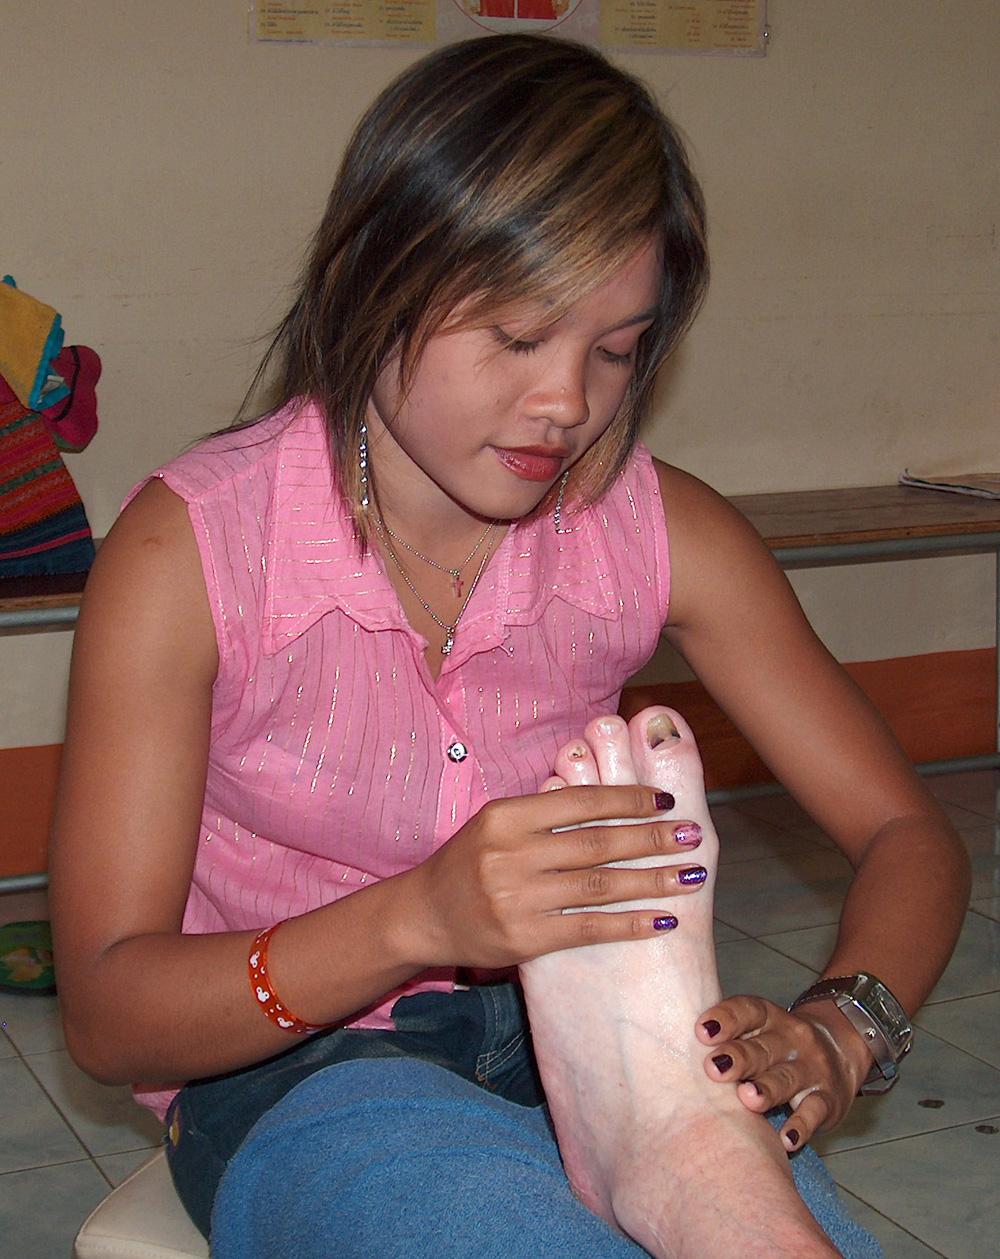 thailandsk massage år ladyboy kbh